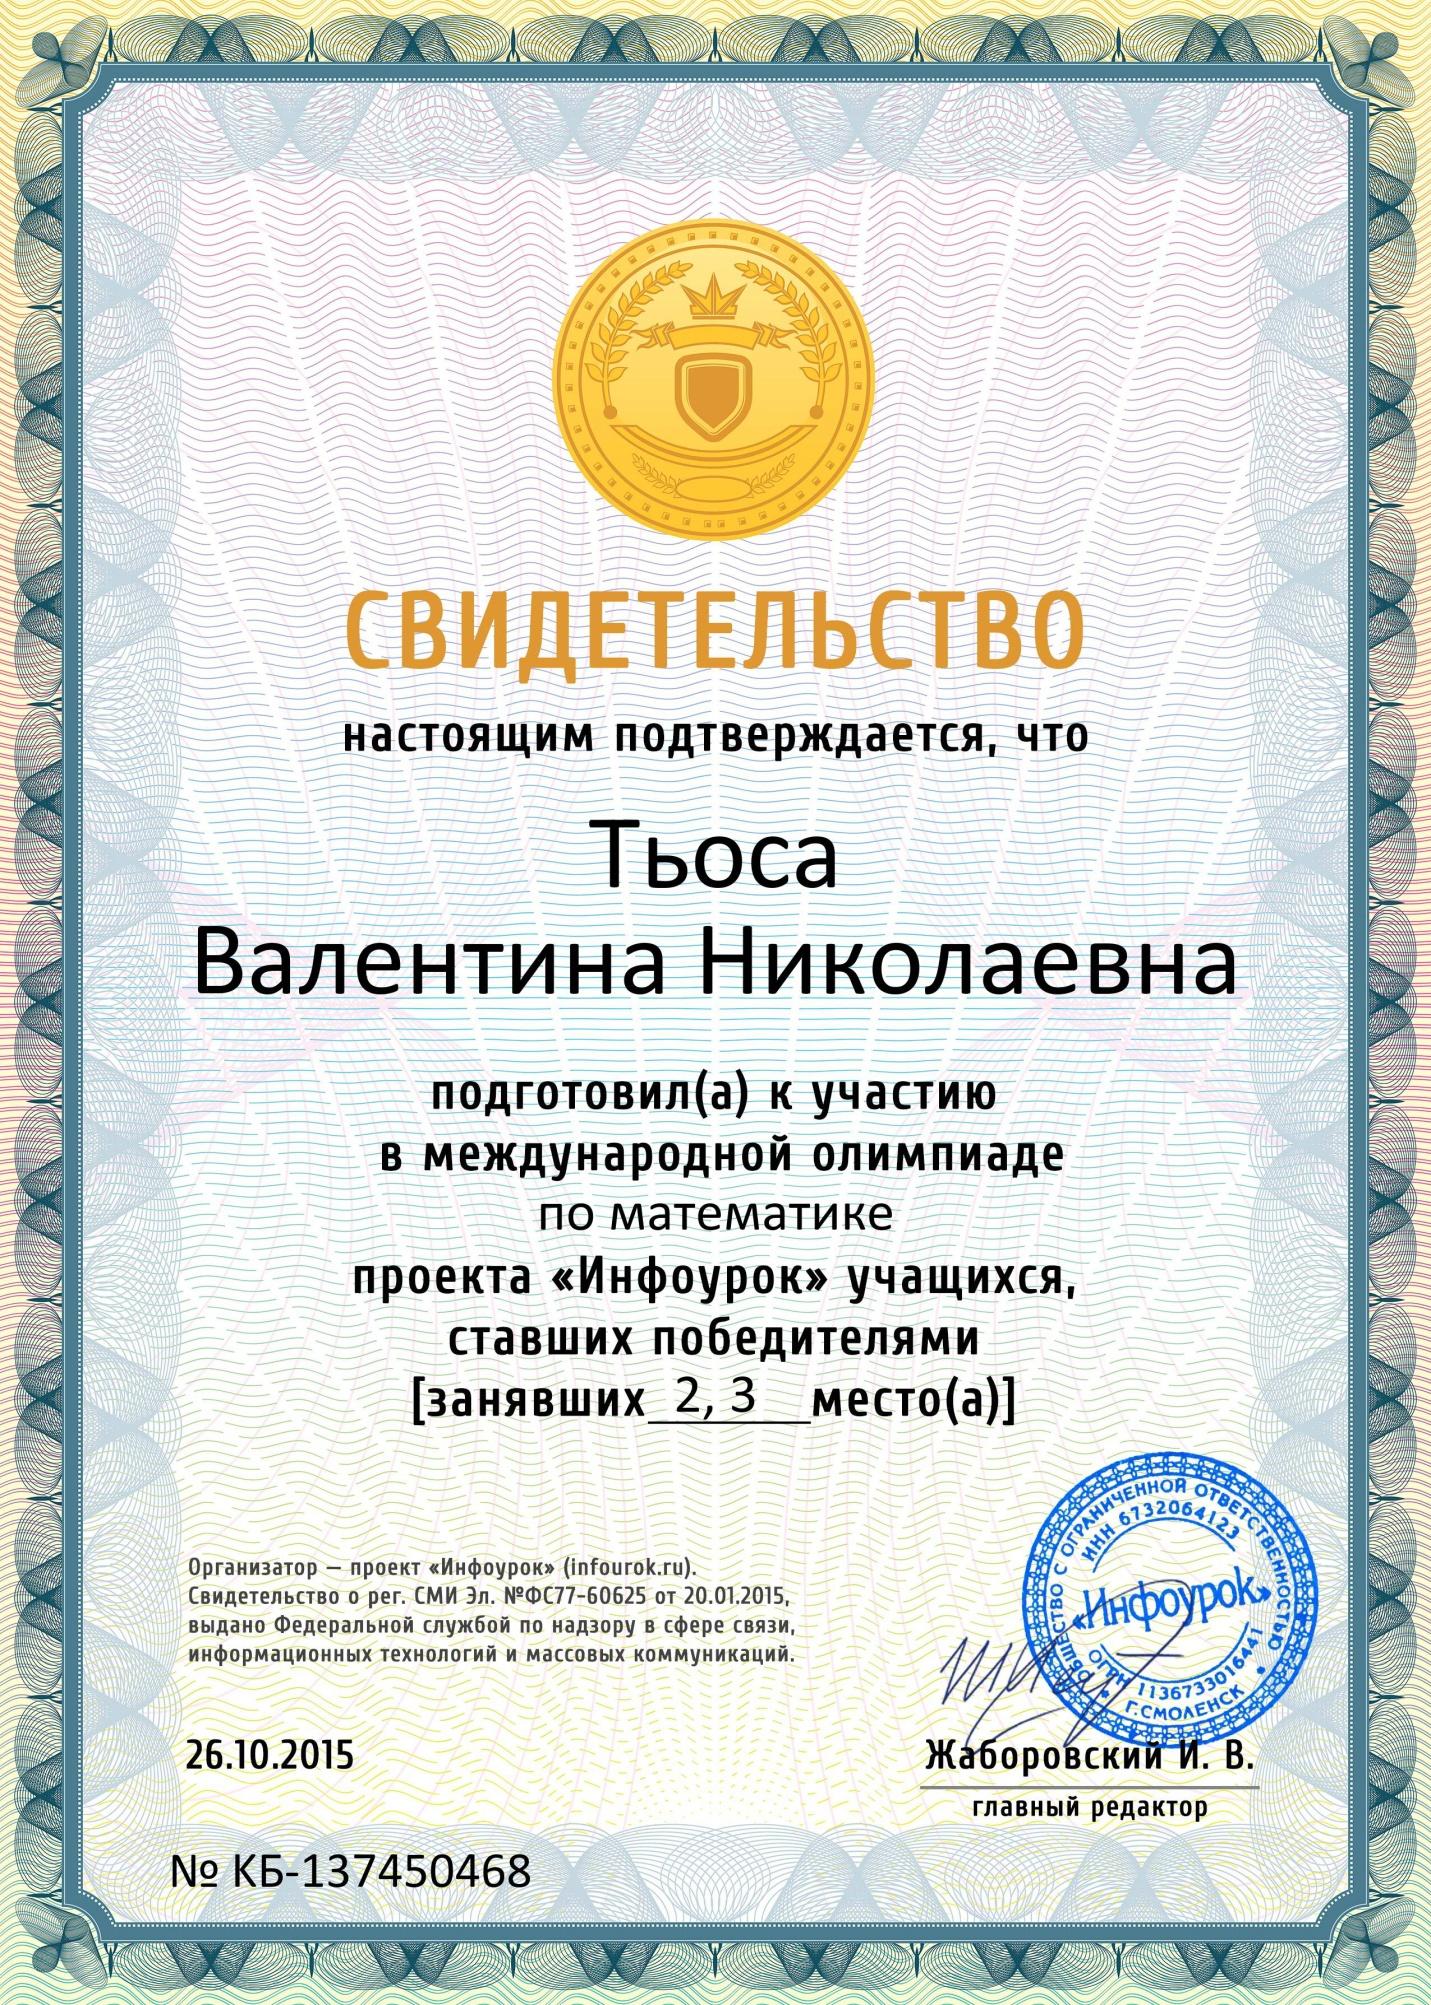 C:\Users\user\Desktop\награды\Свидетельство проекта infourok.ru № KБ-137450468.jpg